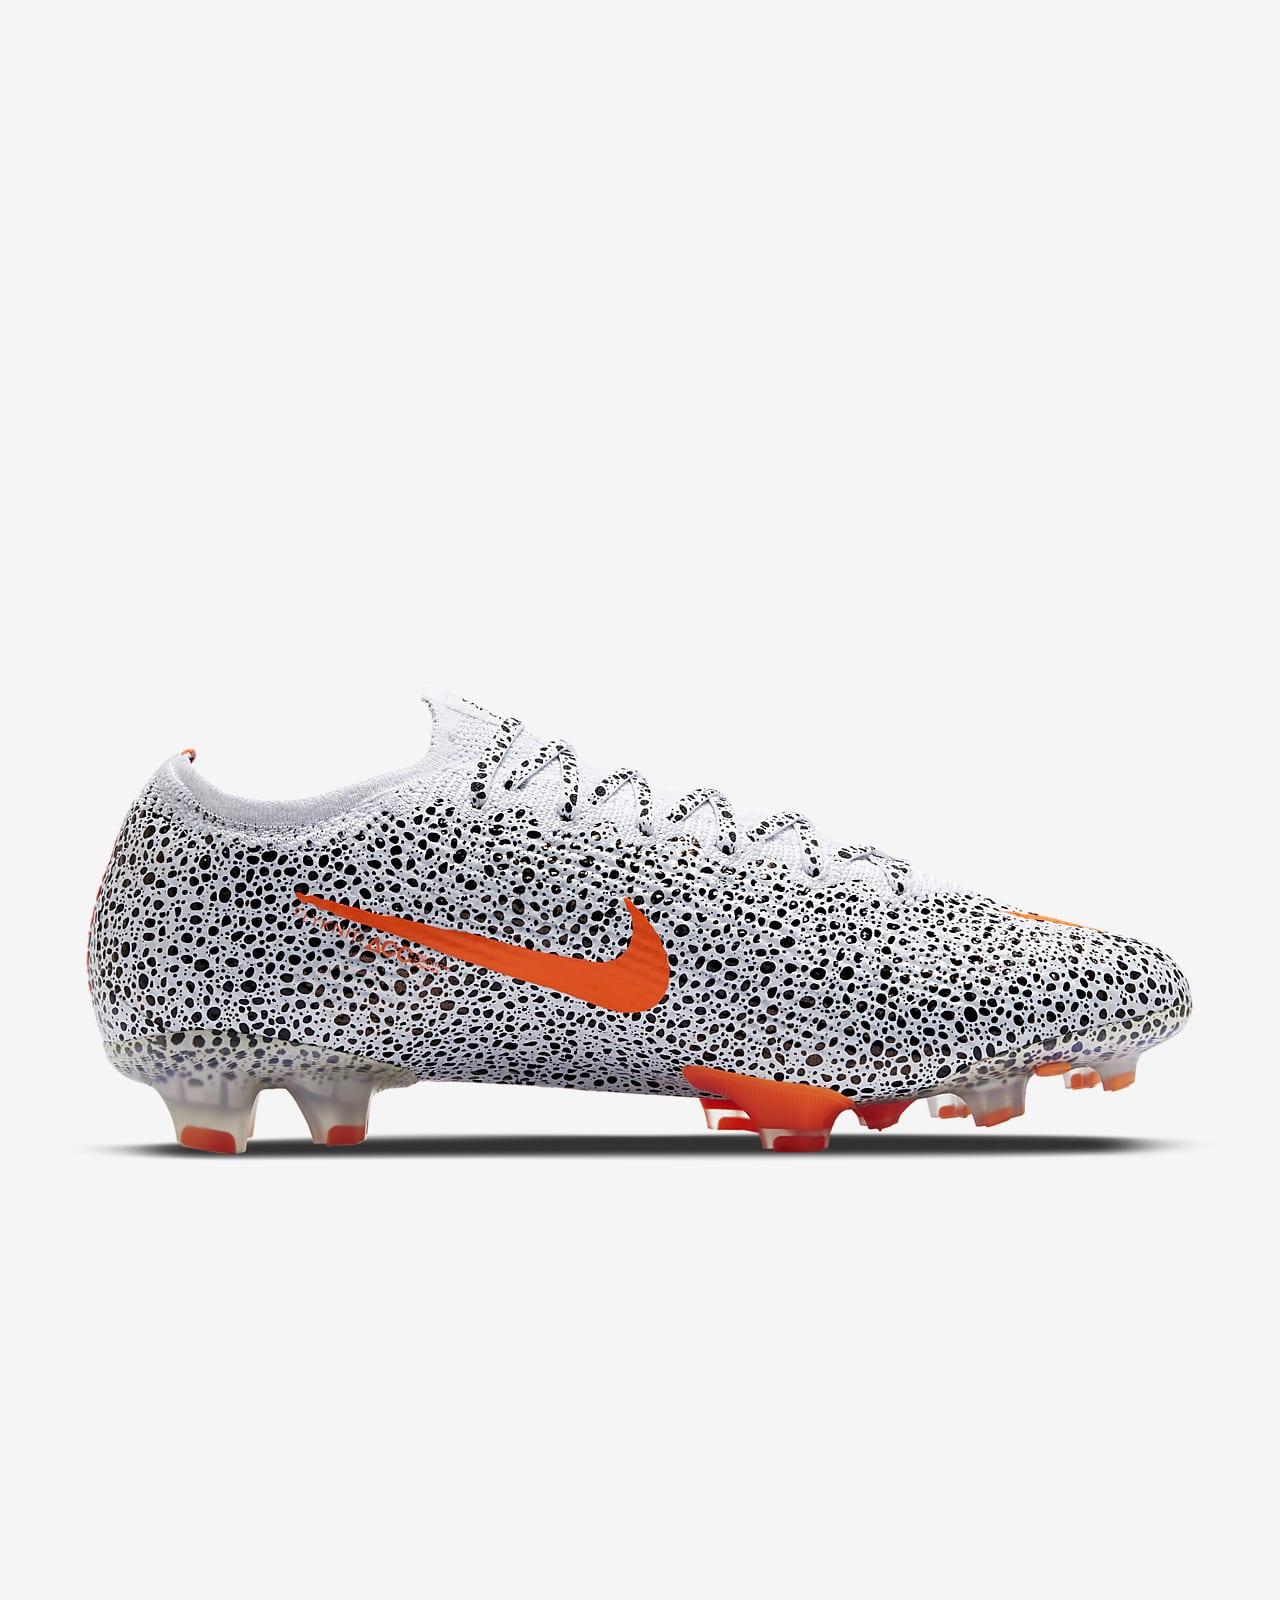 Chaussure de football à crampons Nike Mercurial Vapor 13 Elite CR7 Safari FG pour terrain sec